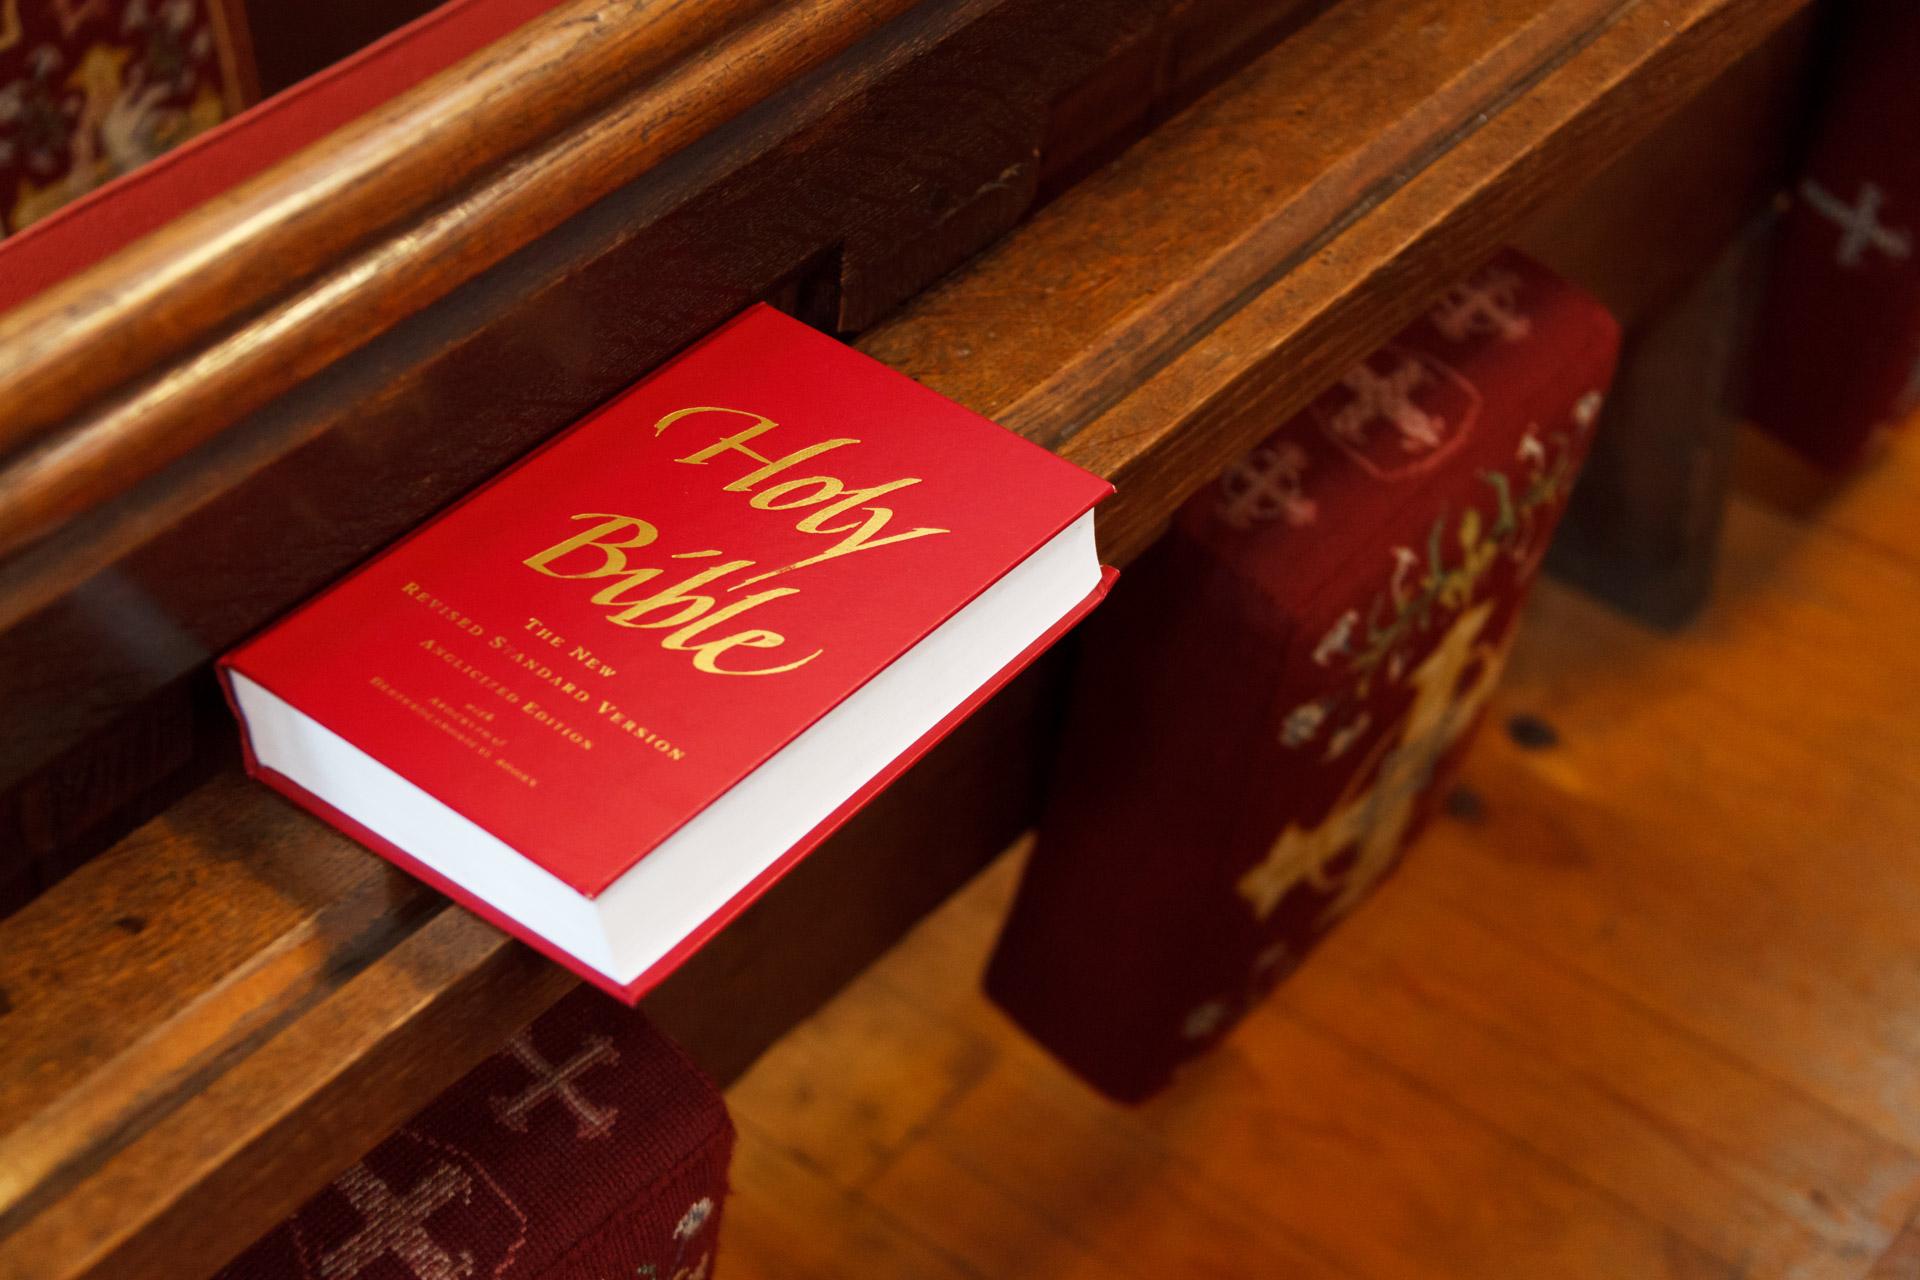 holy-bible-in-church_488011